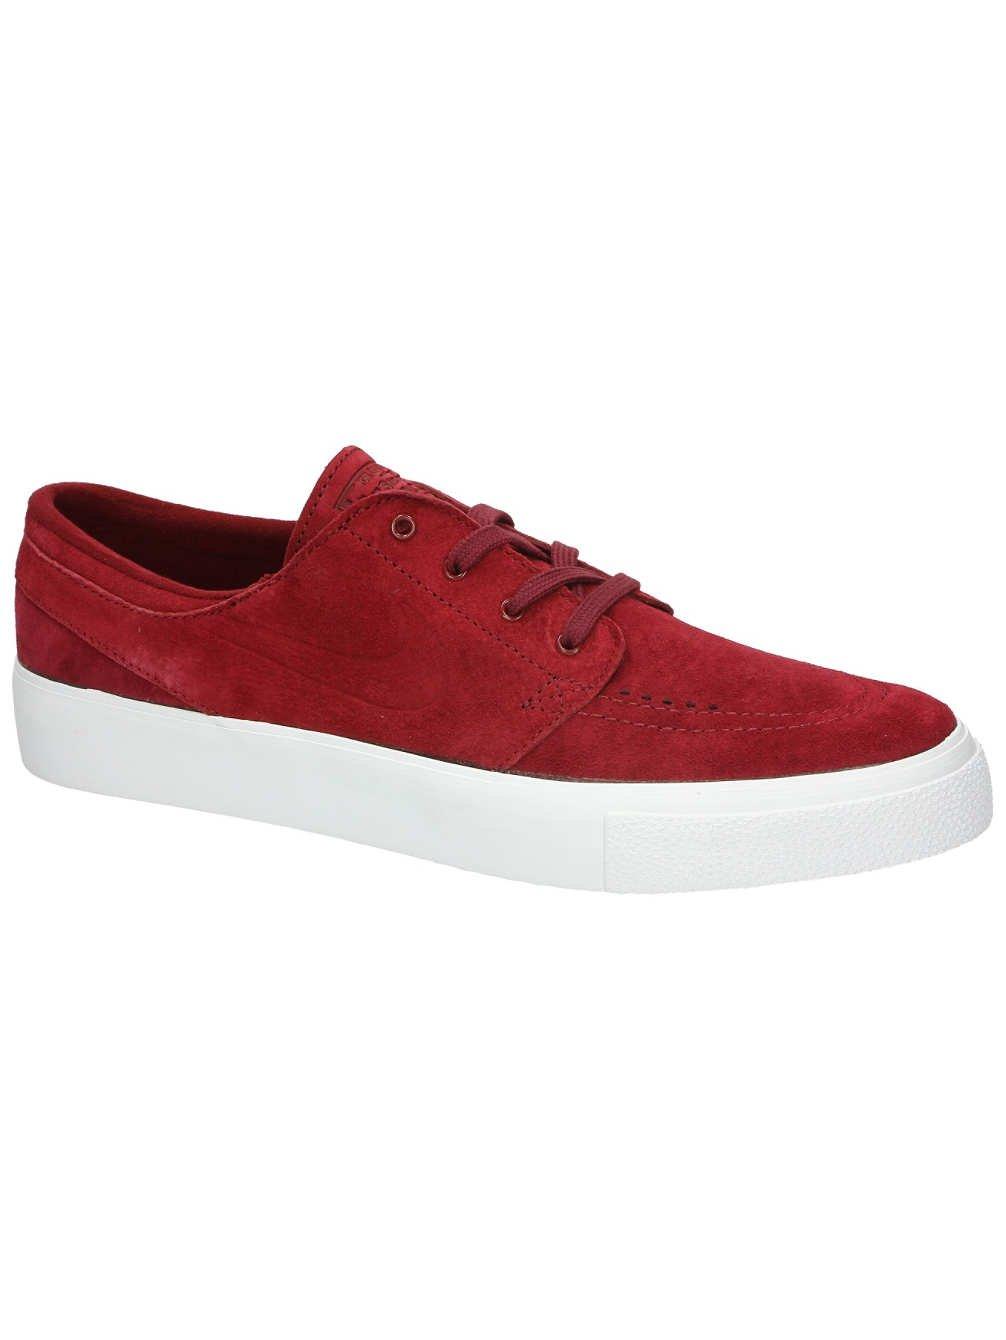 4c904c1cc6dc Galleon - Nike Men s Zoom Stefan Janoski Prem Ht Team Red White Low Top  Suede Skateboarding Shoe - 9M